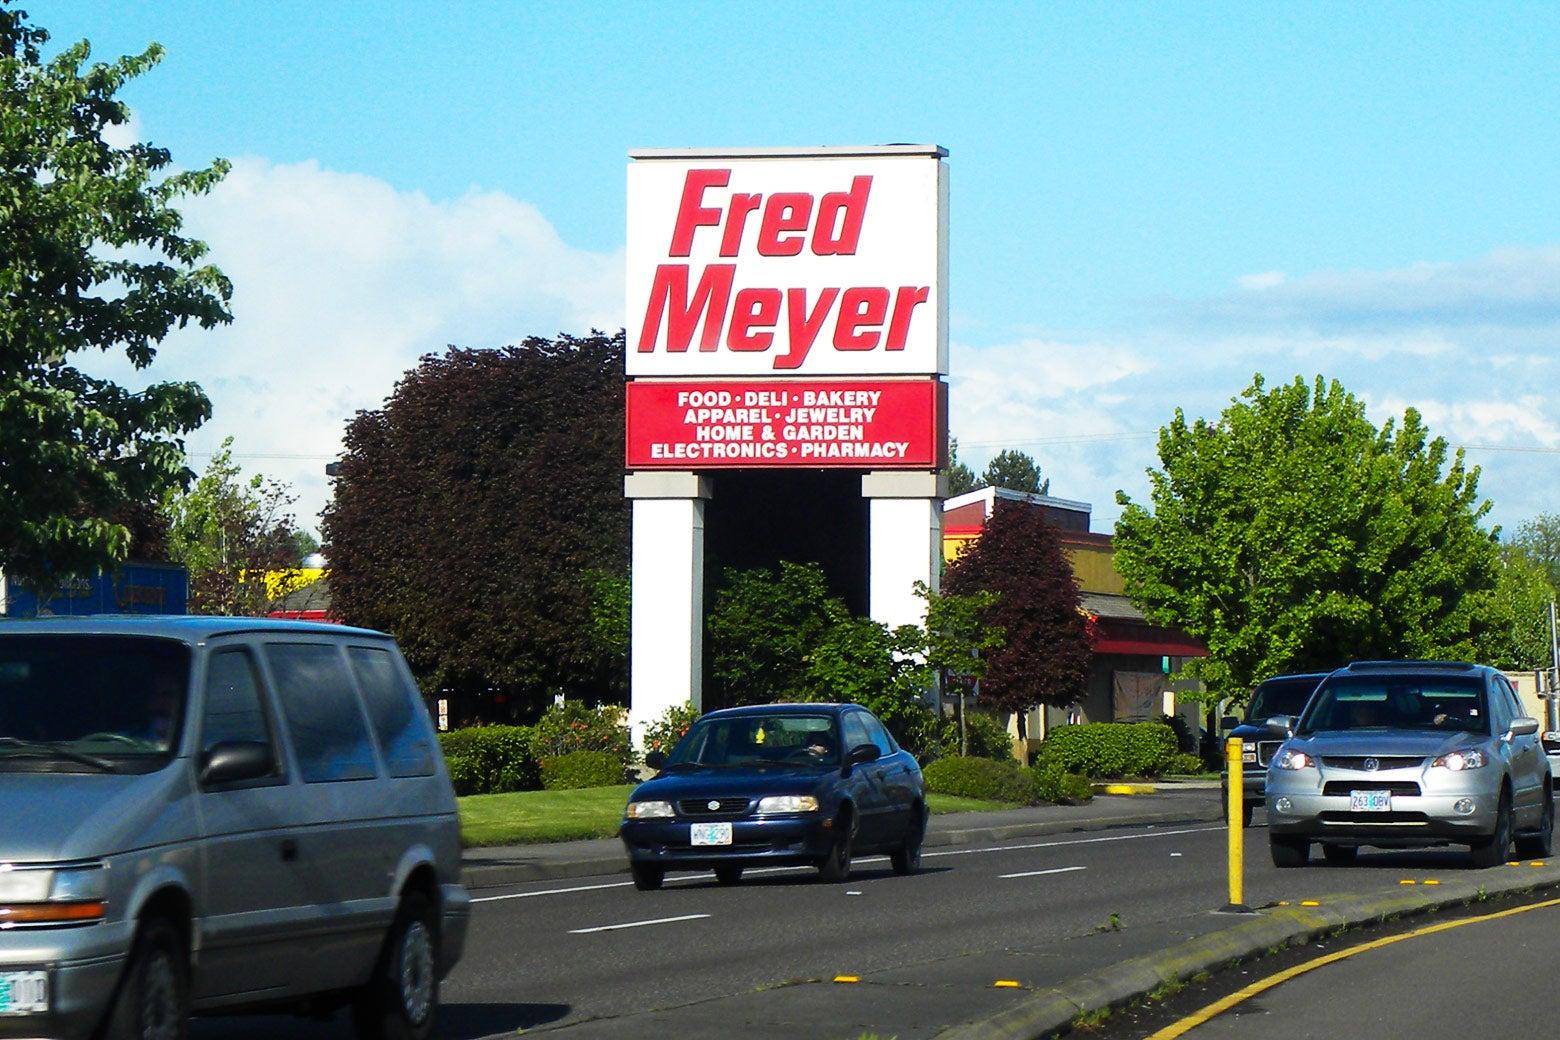 A Fred Meyer store in Hillsboro, Oregon.